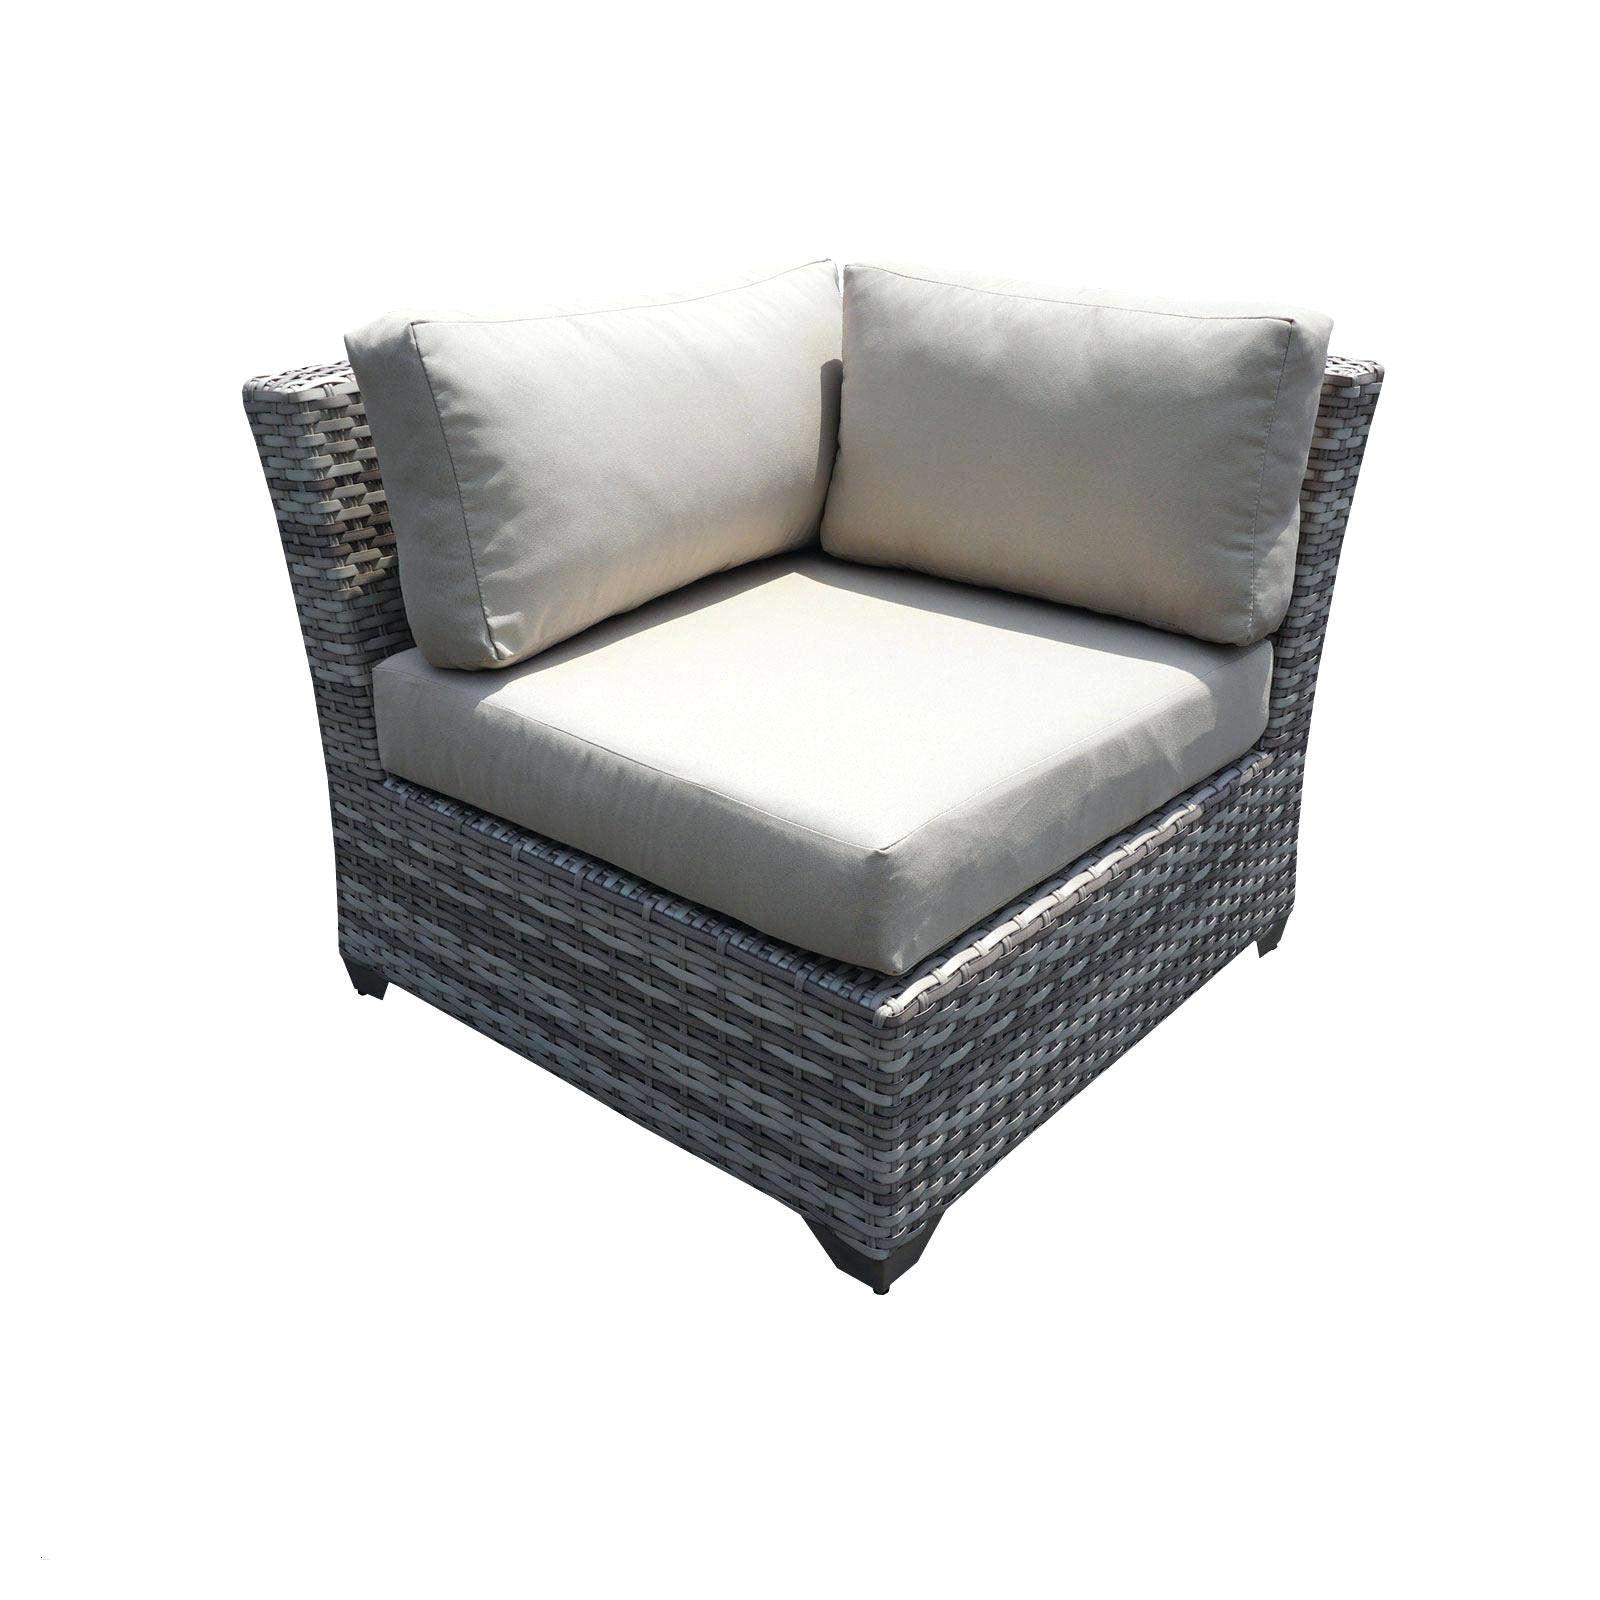 outdoor wicker furniture sale beautiful outdoor rattan furniture beautiful wicker outdoor sofa 0d patio